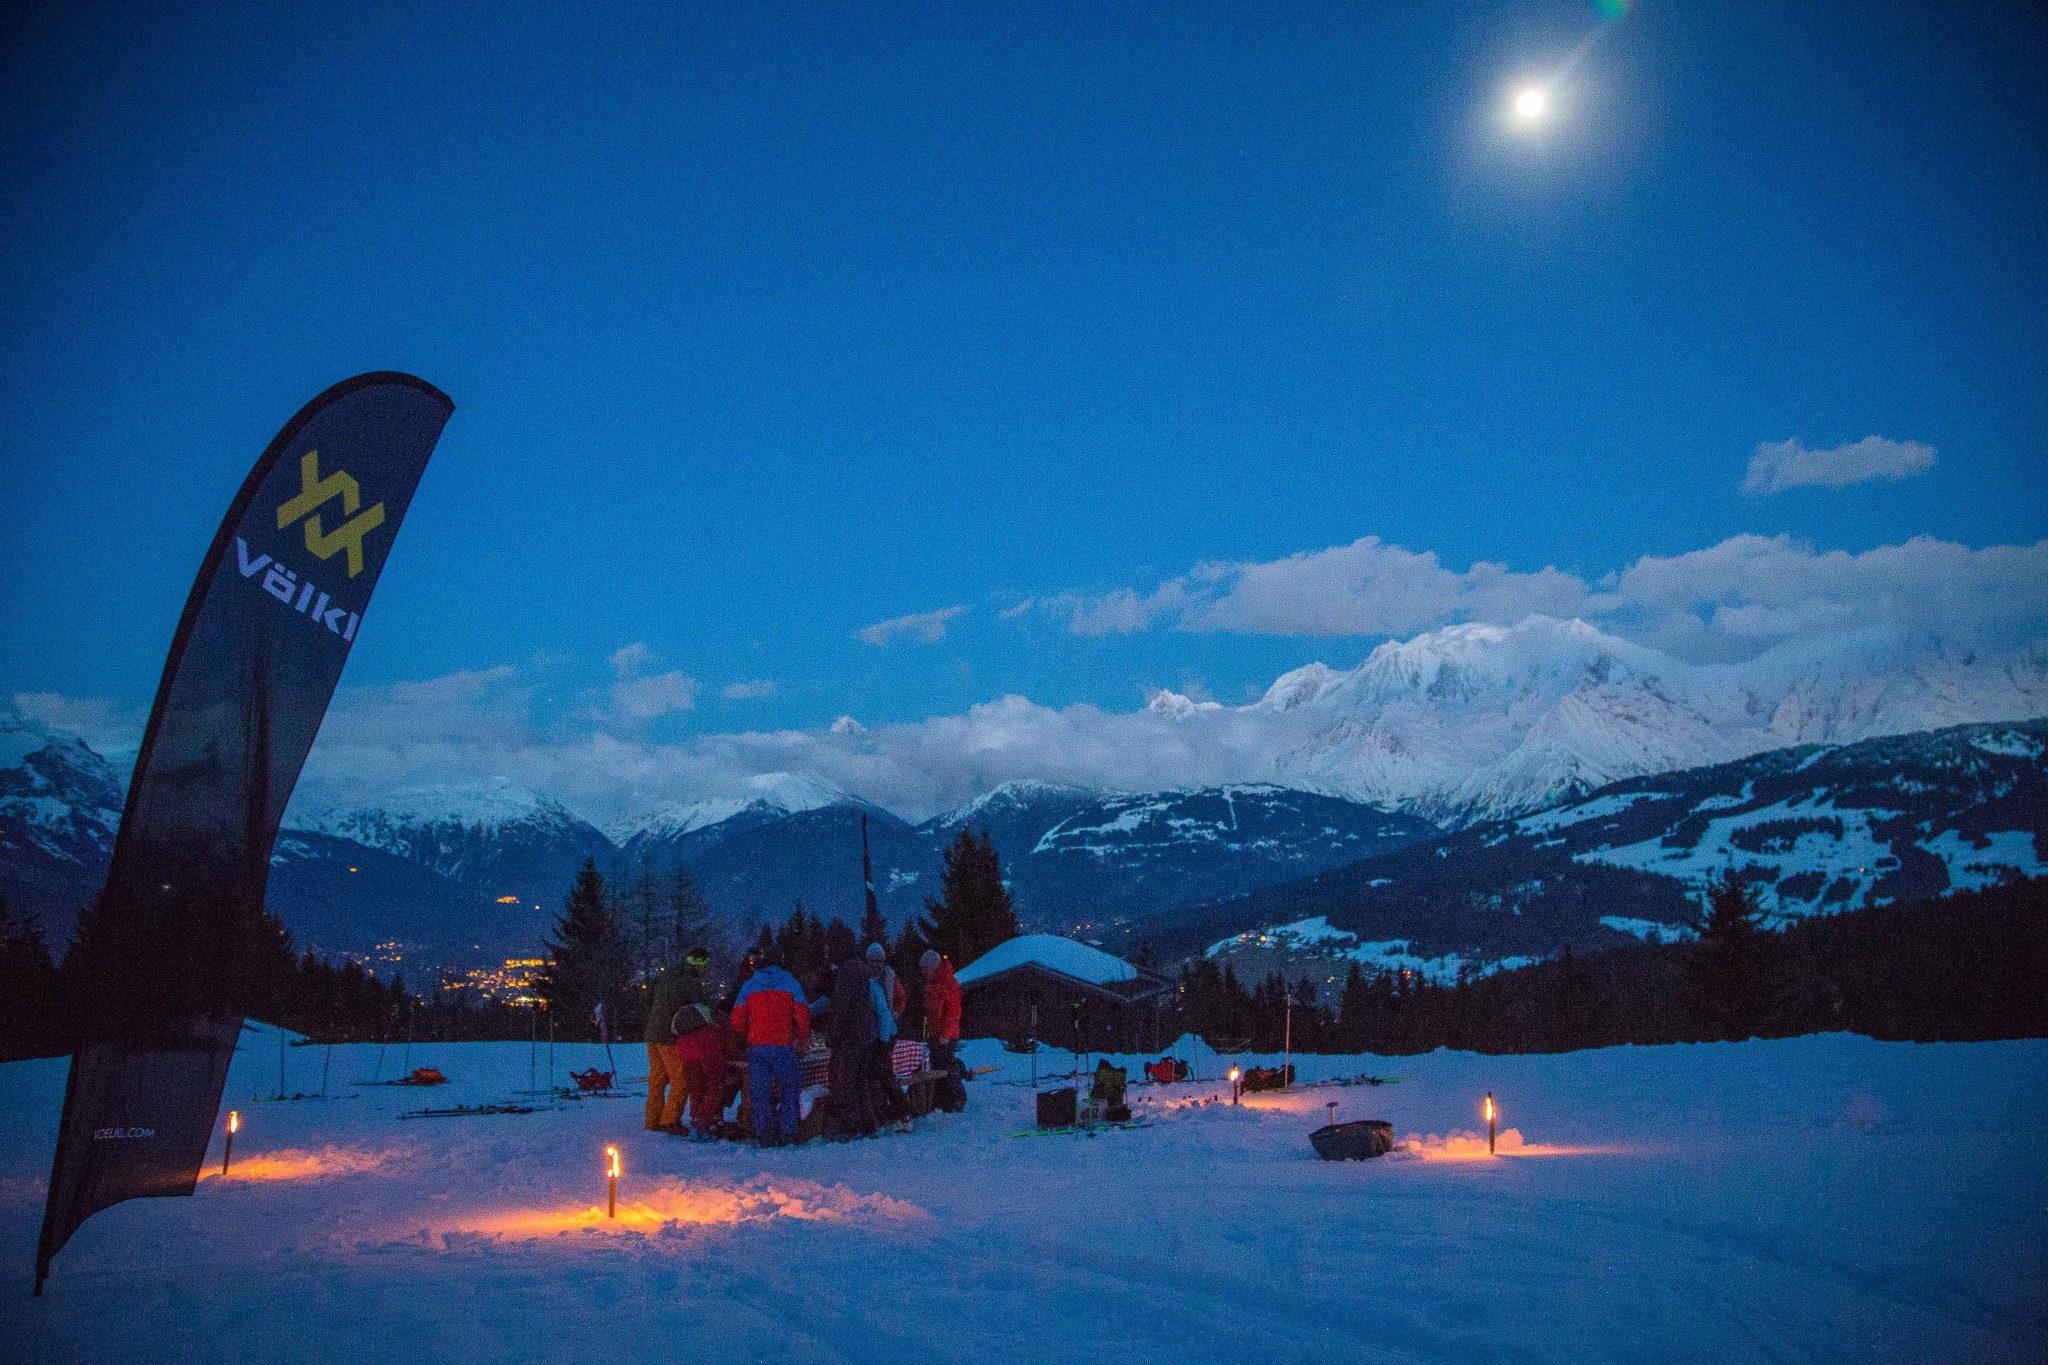 Afterwork Alpinist 2018 - Combloux-Full Moon